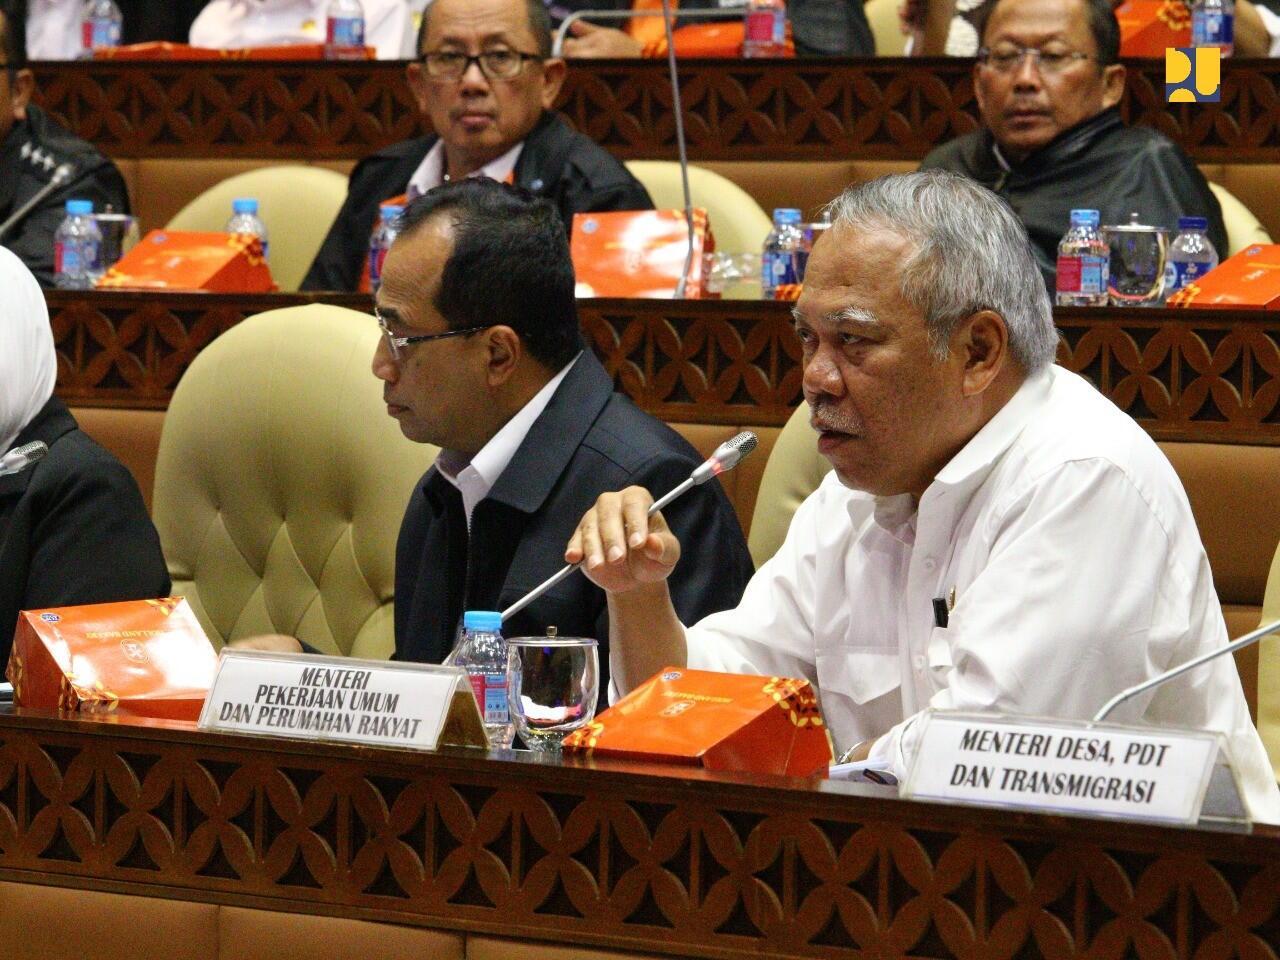 Anggaran Infrastruktur Kementerian PUPR Tahun 2019 Capai 110,7 Triliun